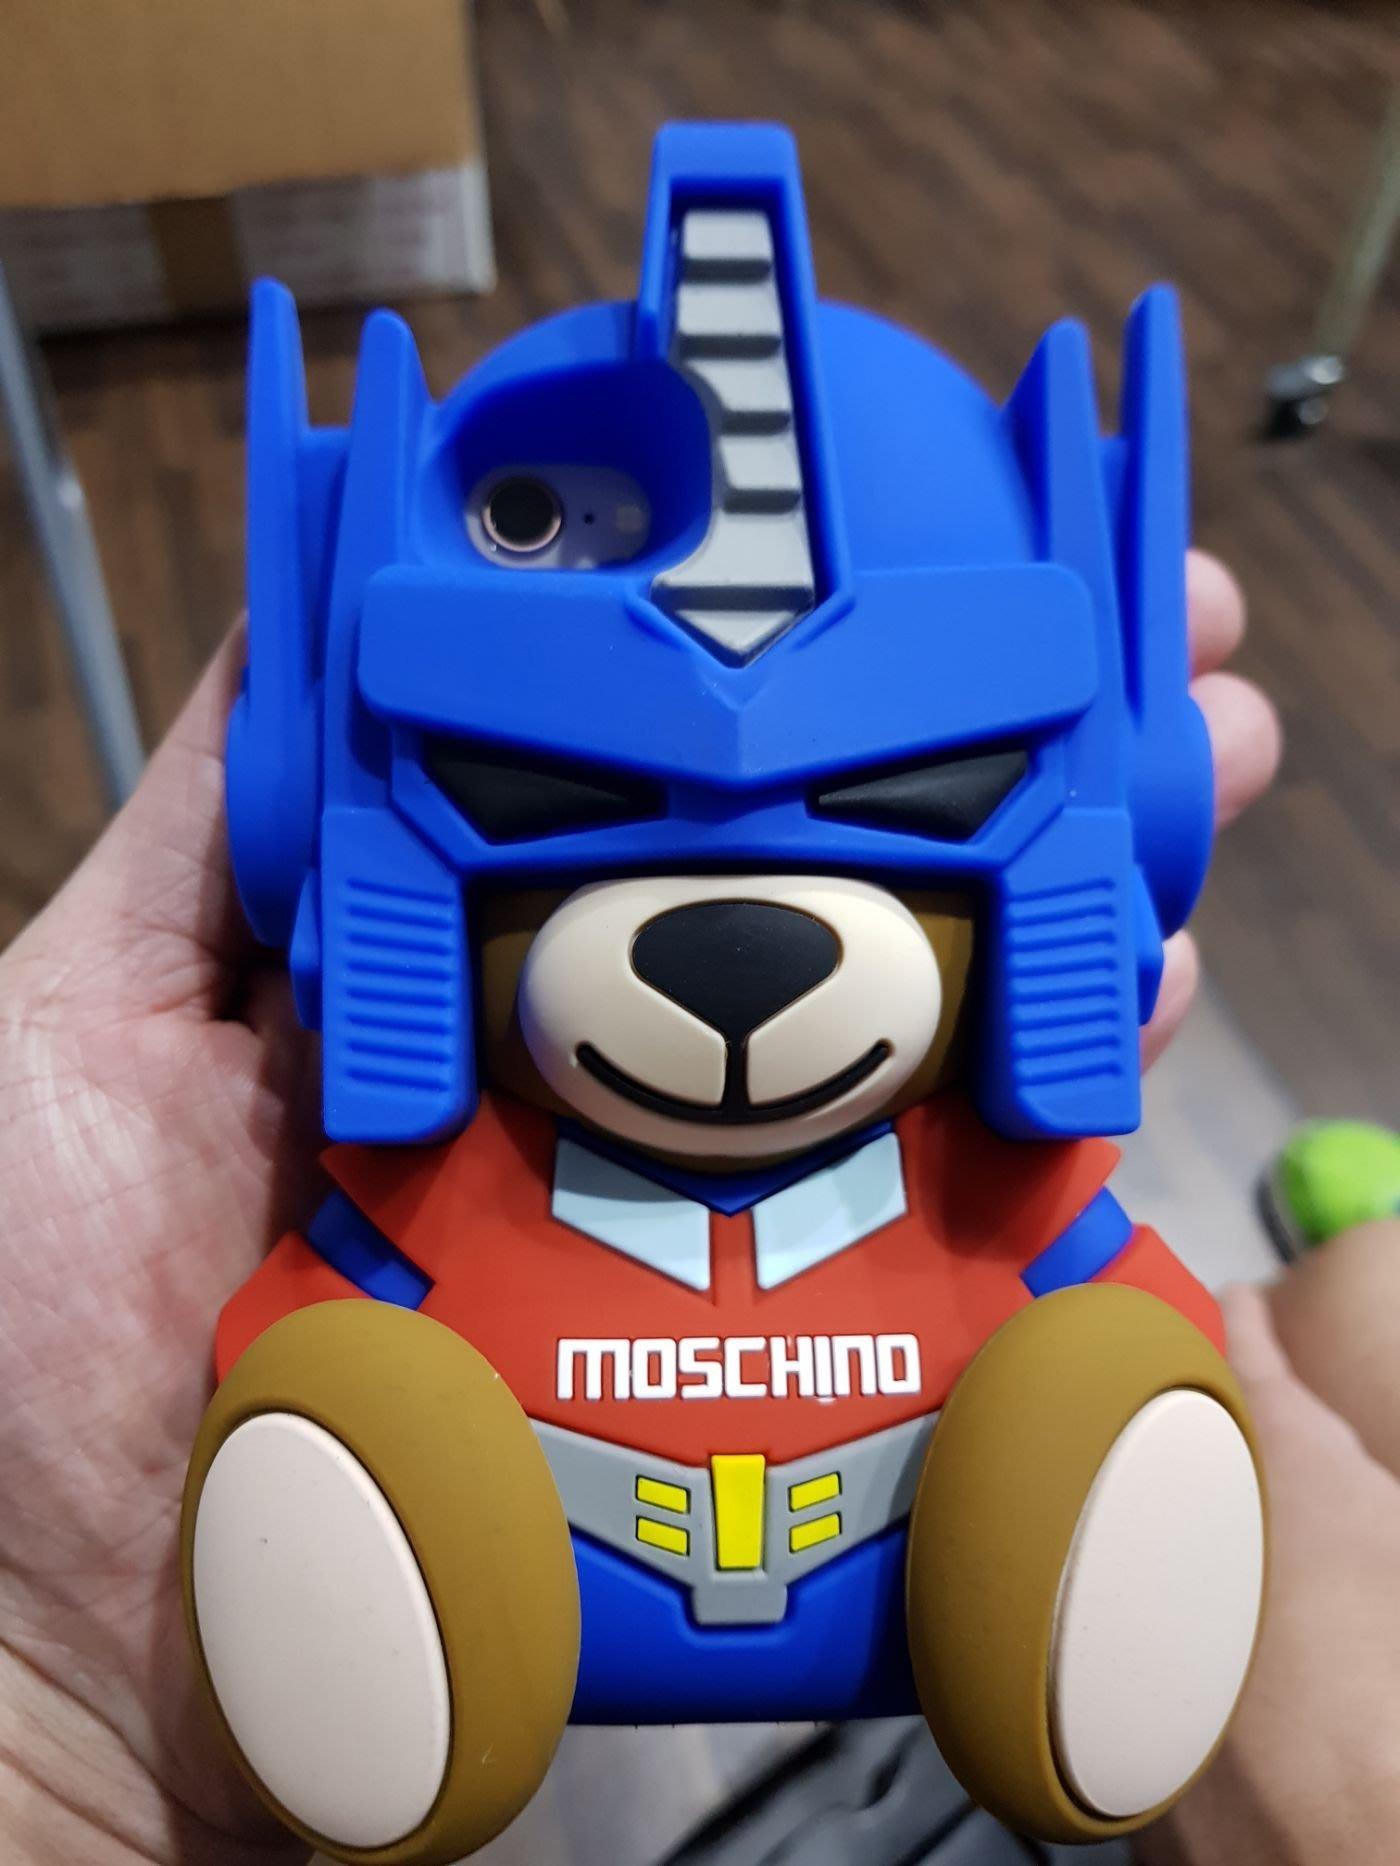 【EZ兔購】~正品 Moschino iPhone i6/i7 case 變形金剛熊手機殼 i6/i7 現貨